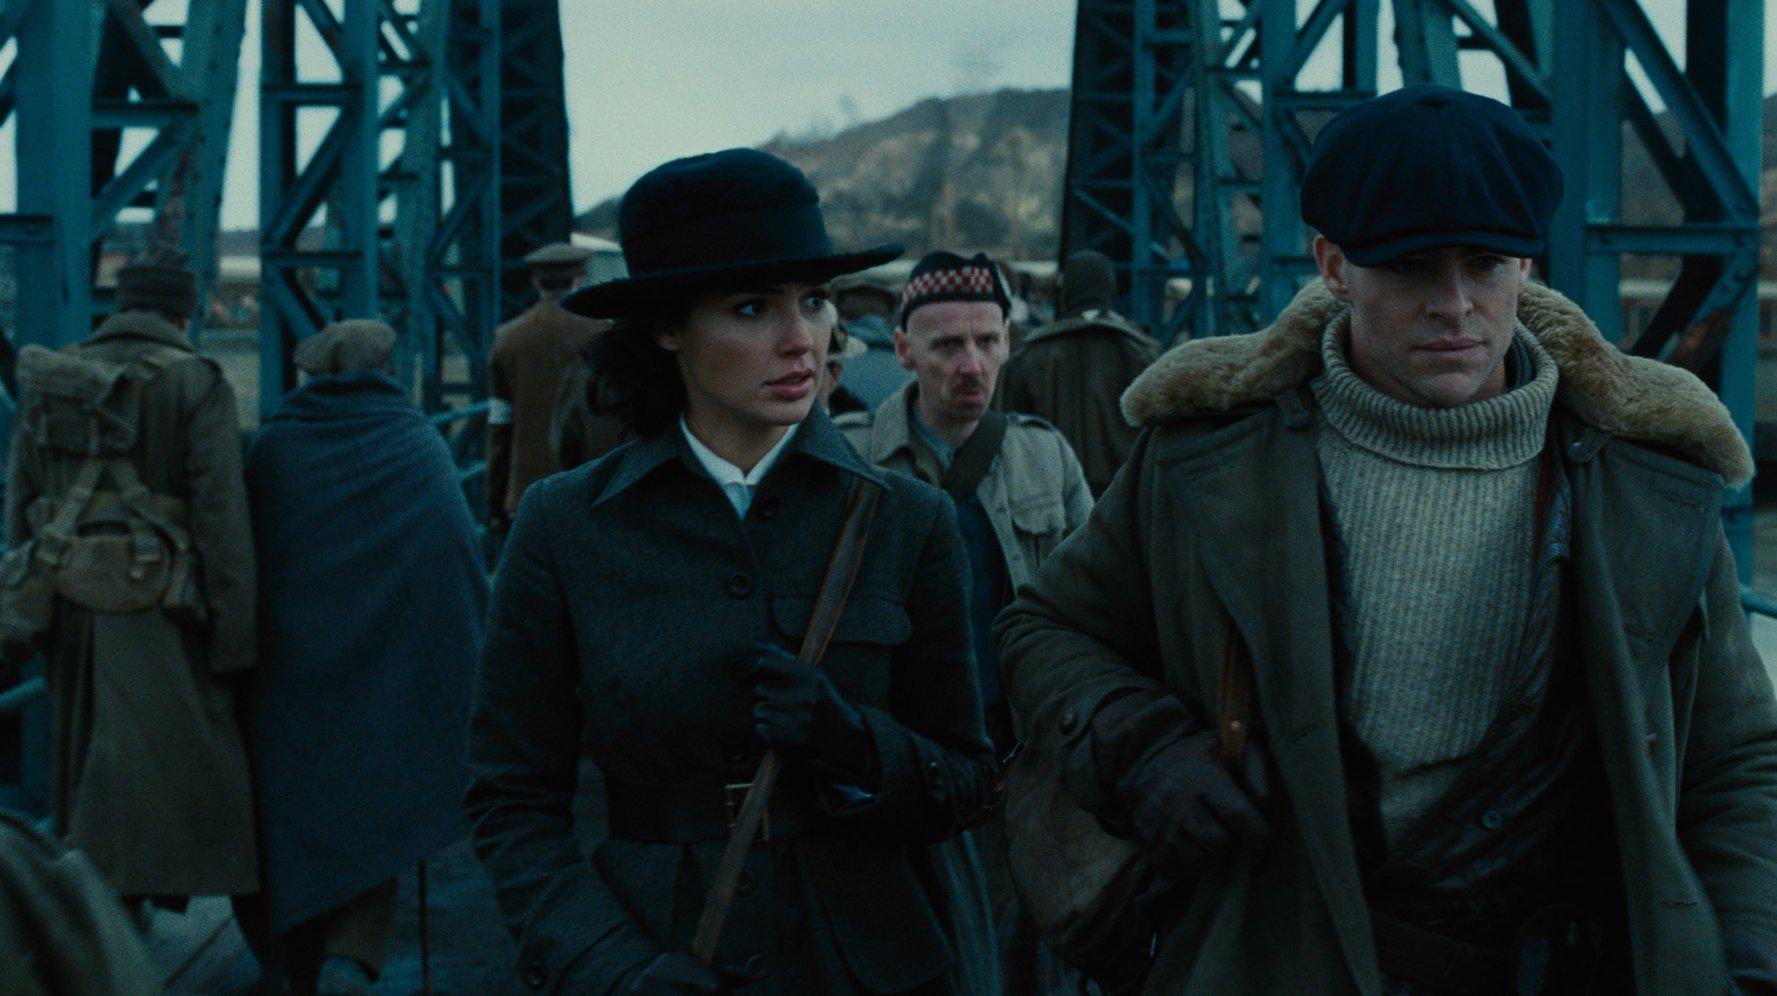 Wonder Woman Movie Review | Hola Darla